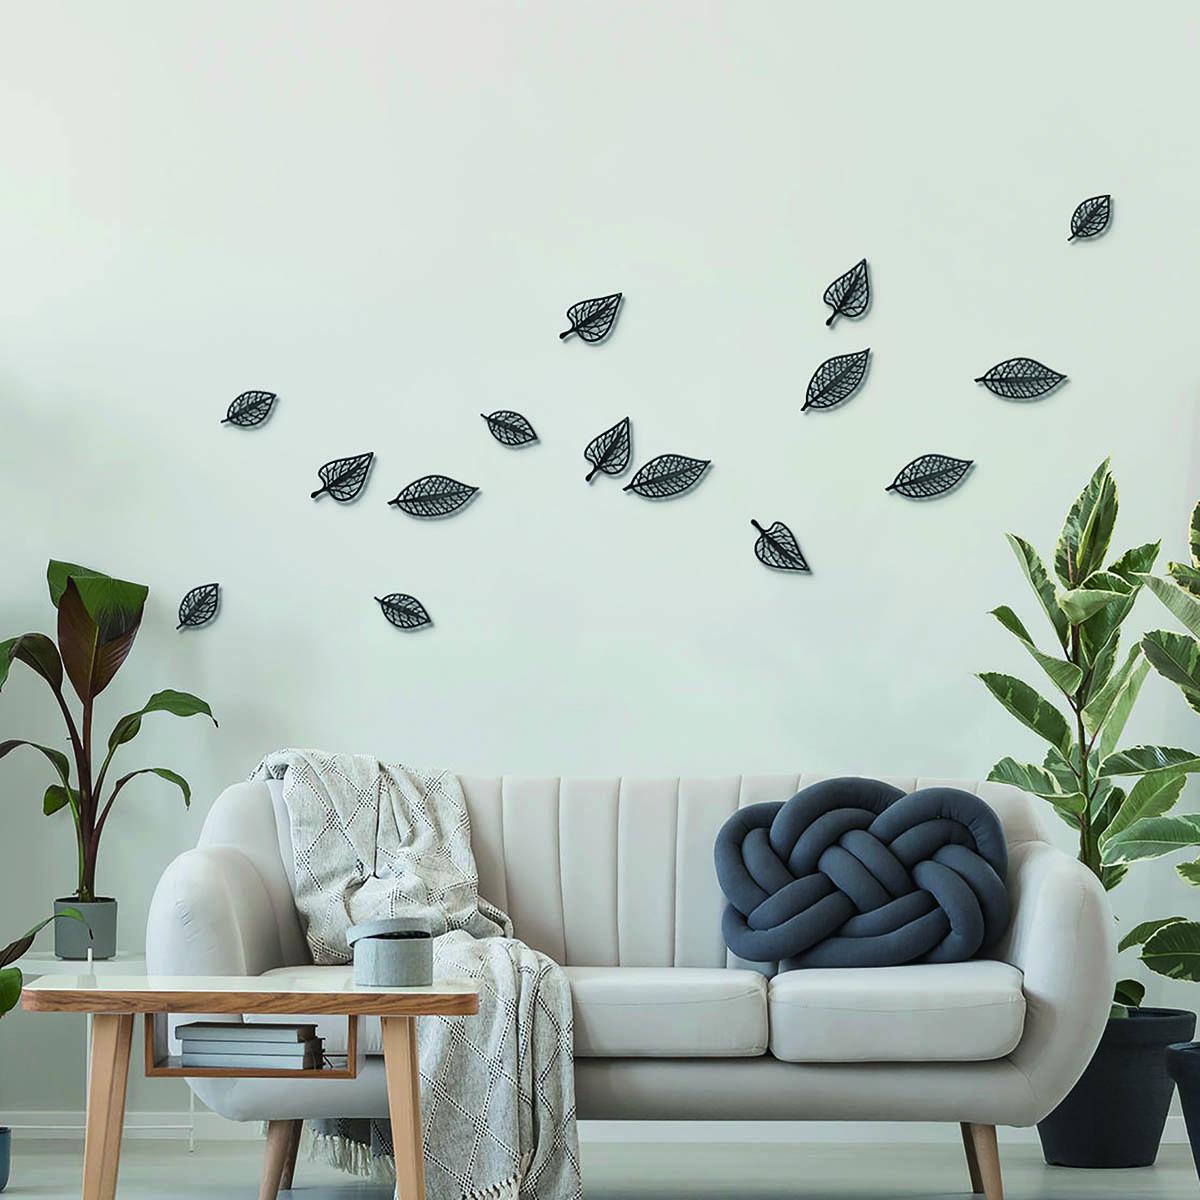 Gray living room interior